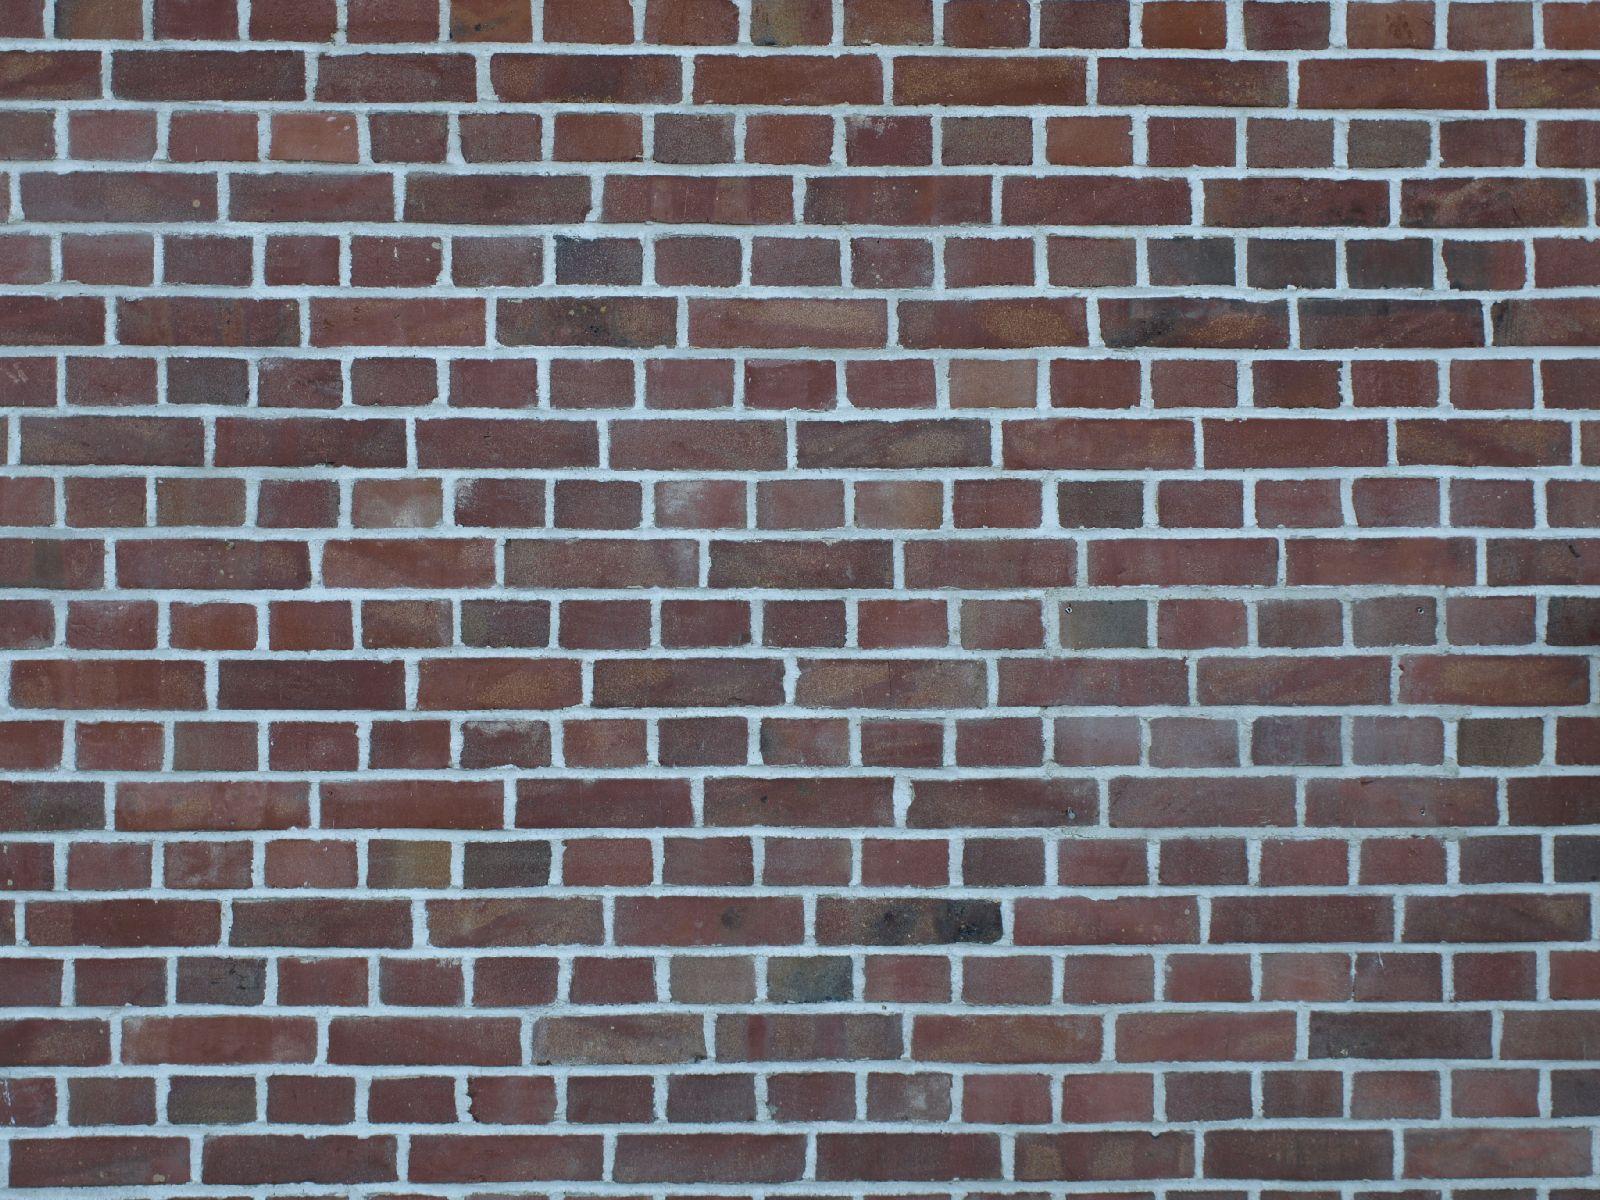 Brick_Texture_A_PC278580